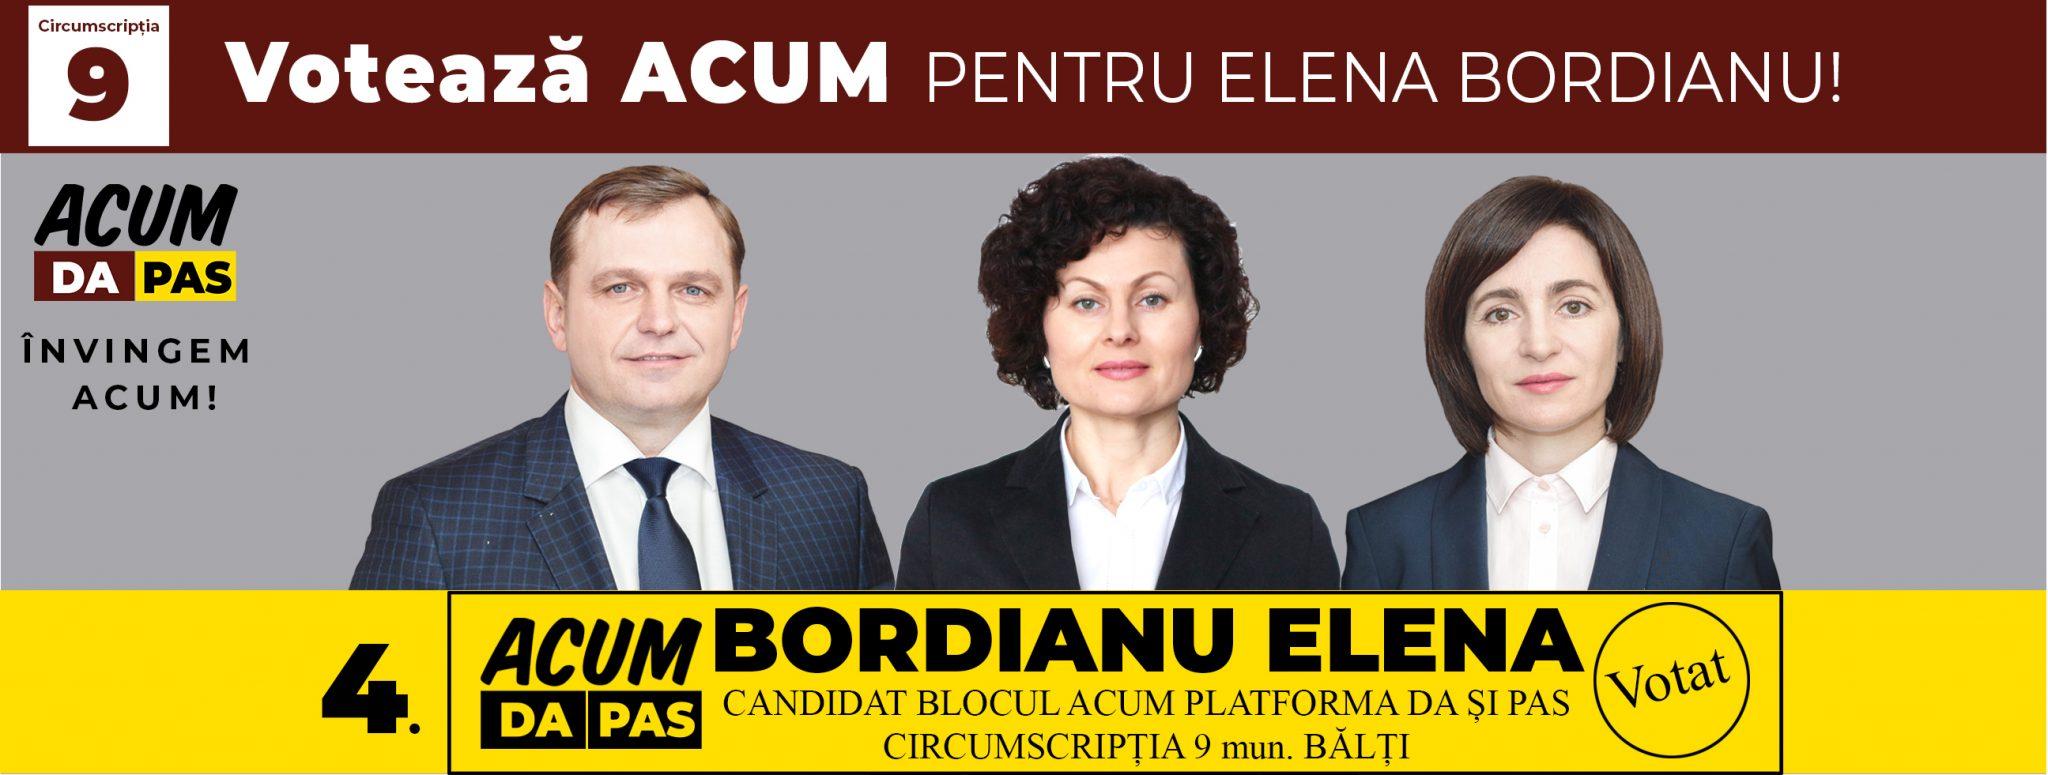 Banner Elena Bordianu